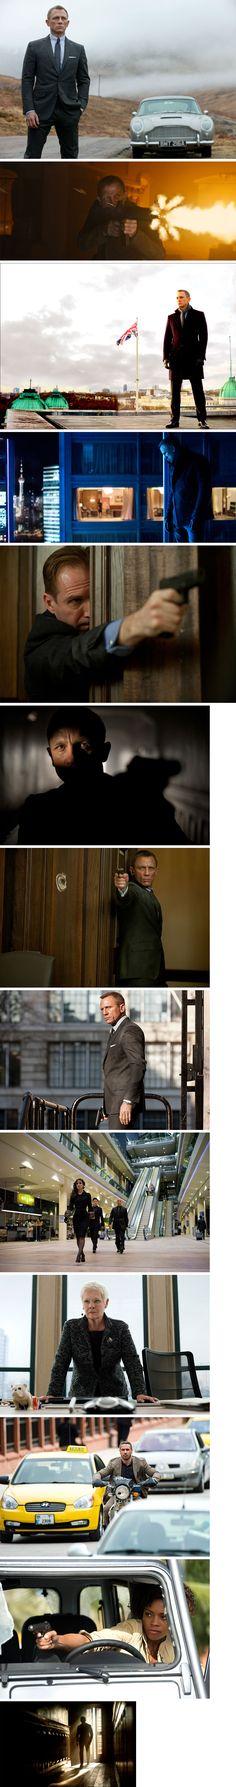 "Scenes from the James Bond movie, ""Skyfall."""